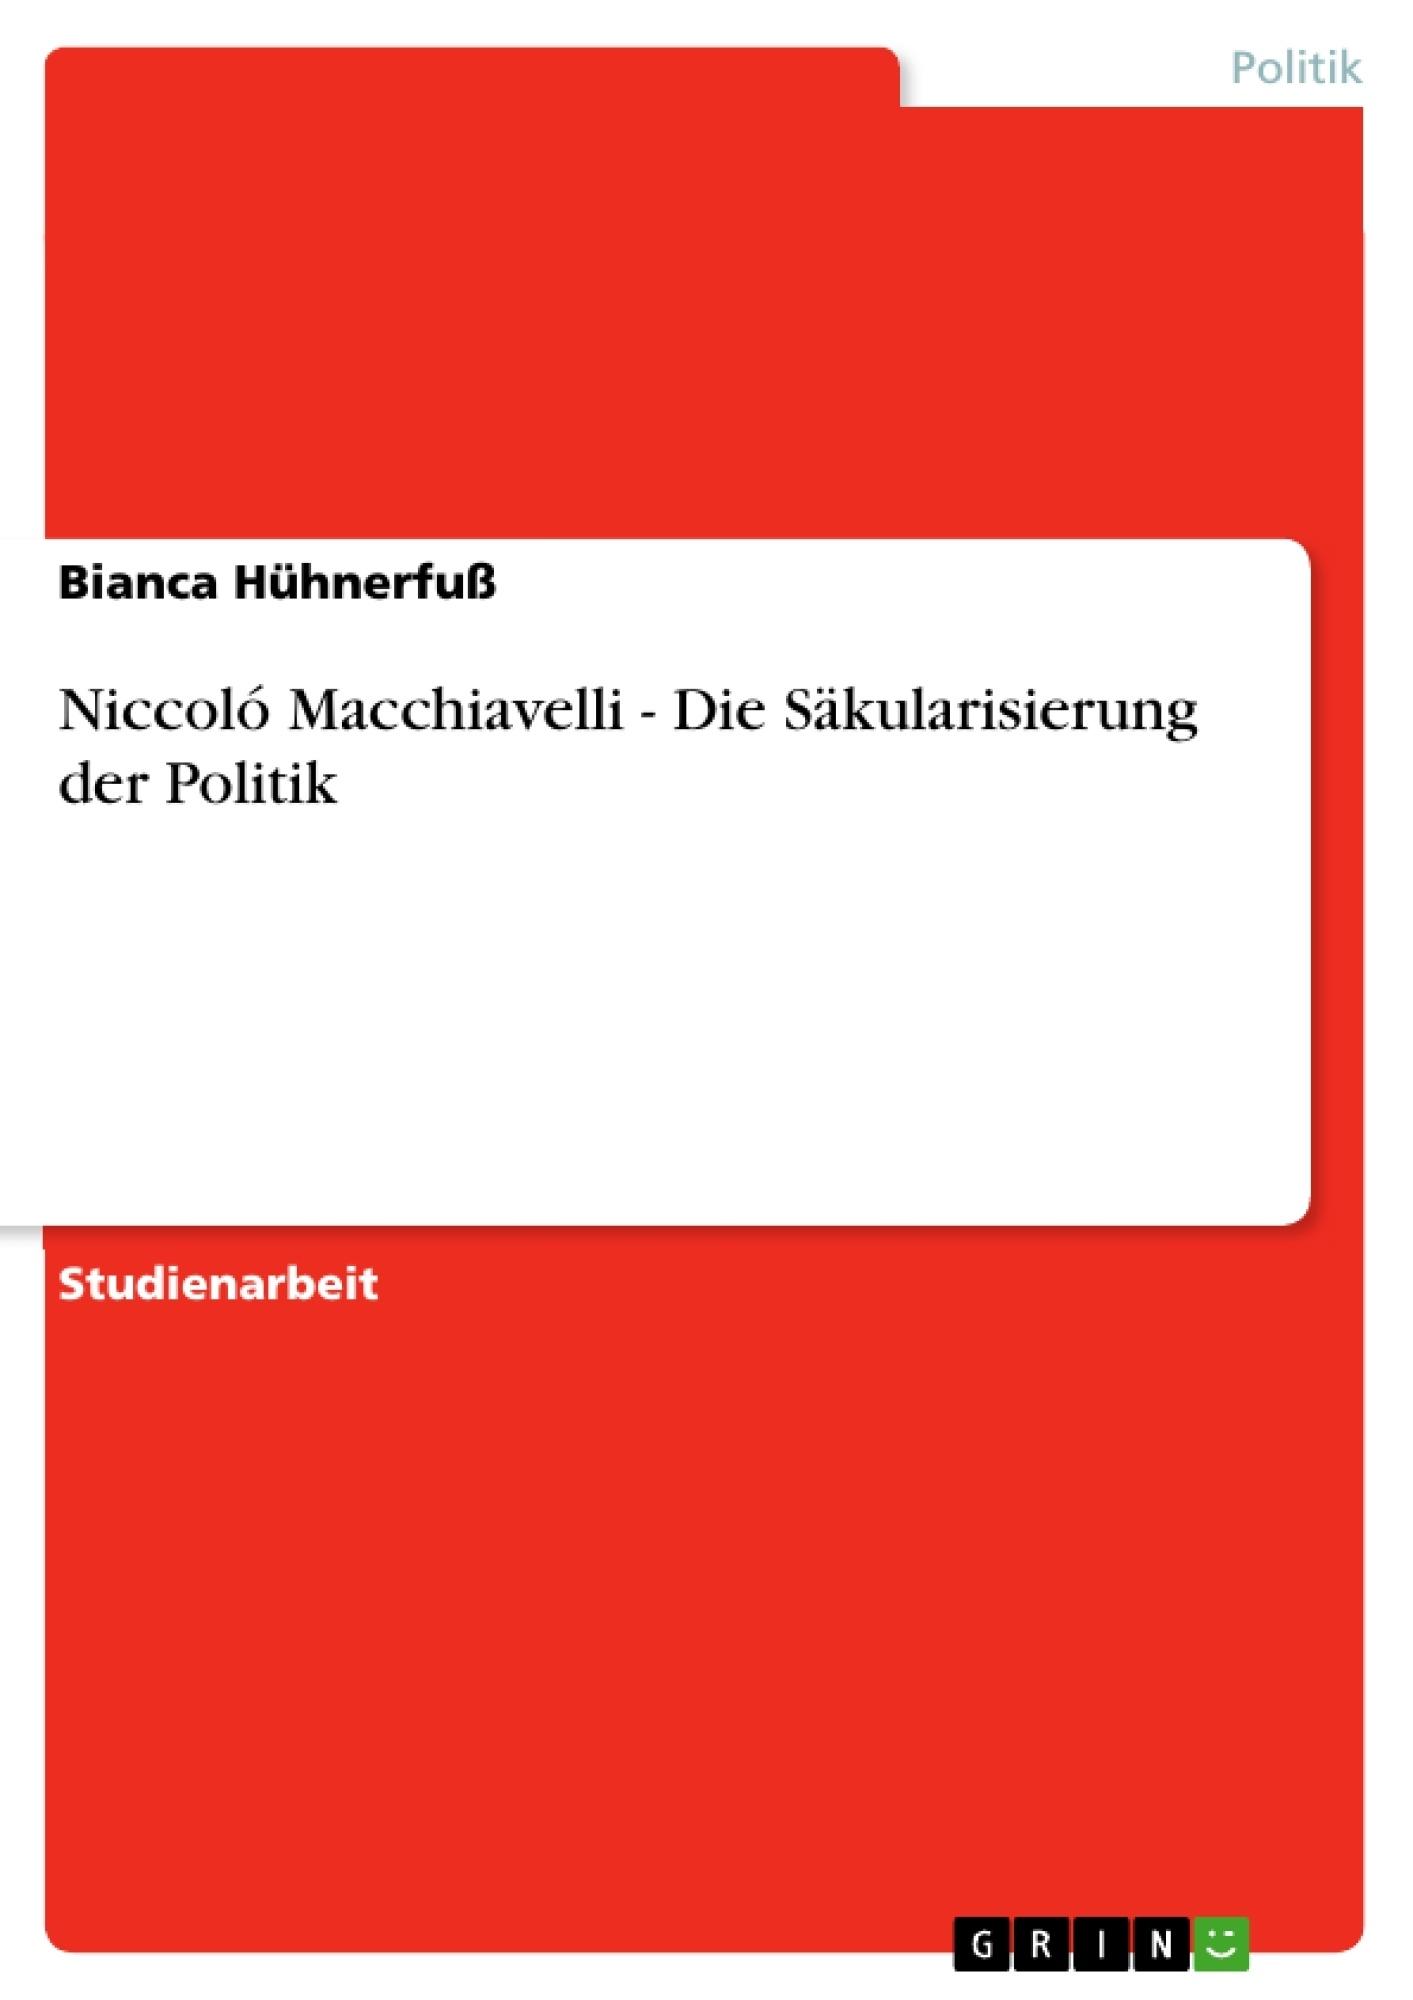 Titel: Niccoló Macchiavelli - Die Säkularisierung der Politik